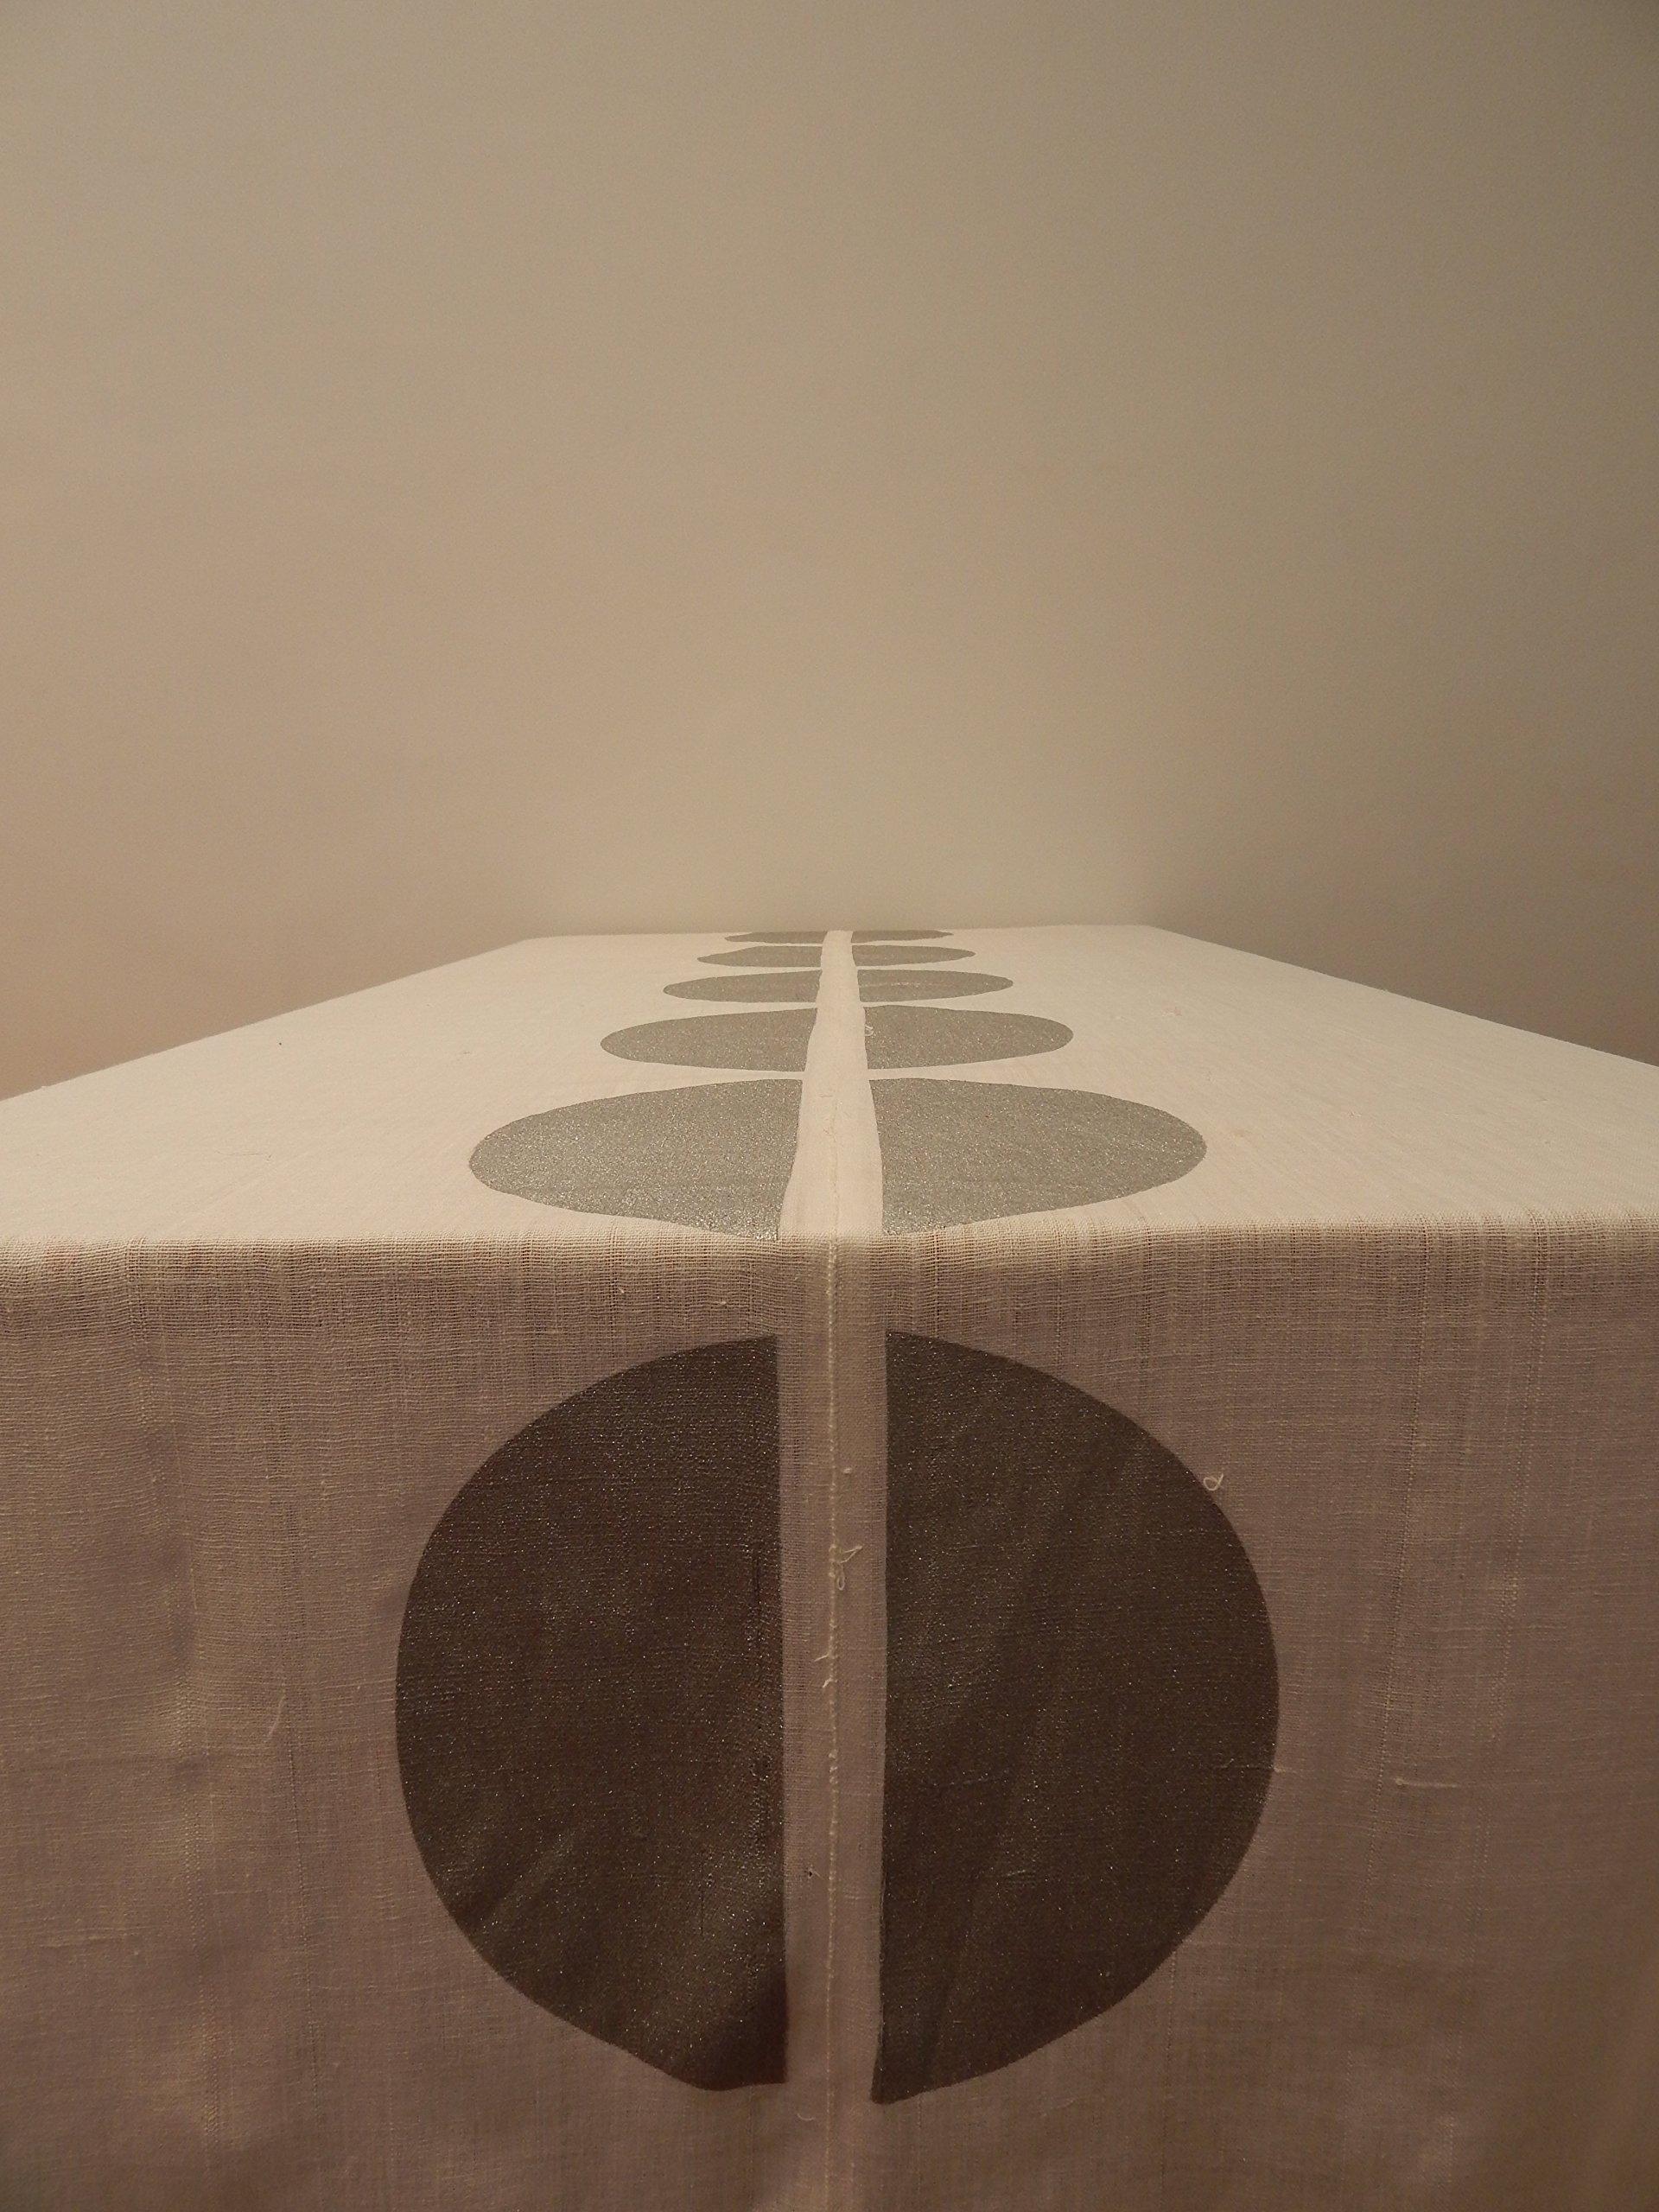 Gitika Goyal Home Cotton Khadi Silver Screen Printed Tablecloth with Dot Design, White, 72'' x 72''